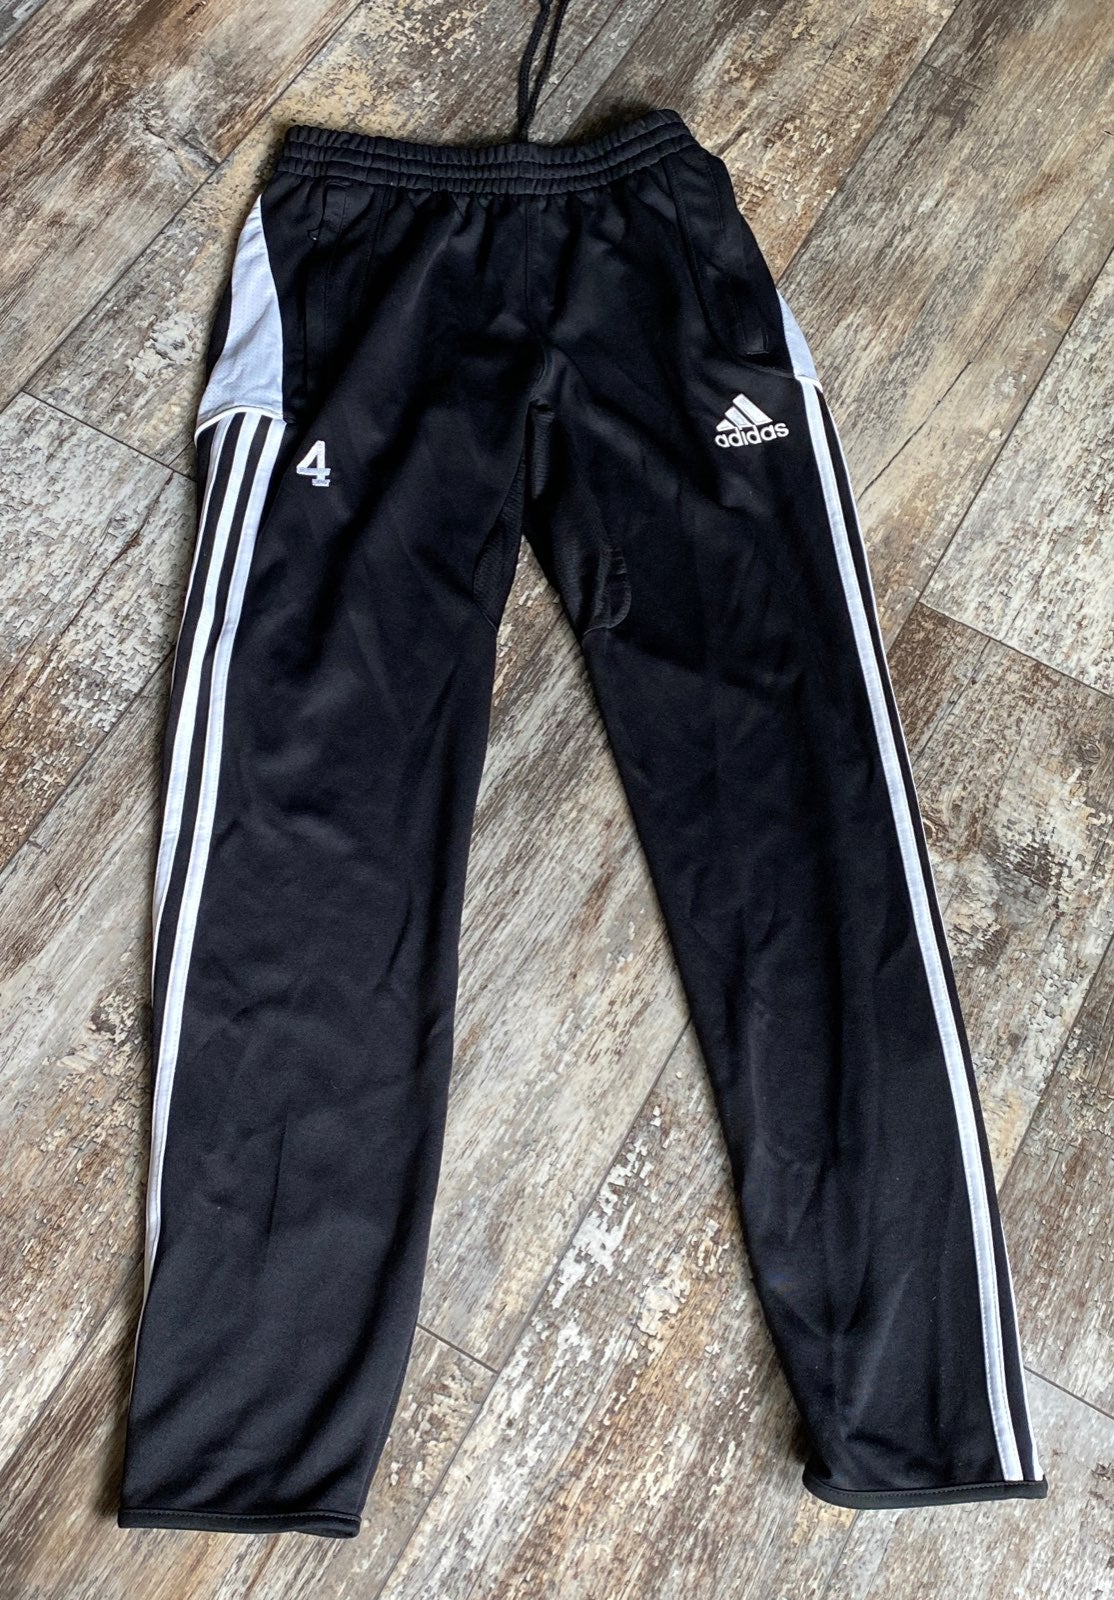 Adidas Unisex Climalite Jogger pants S